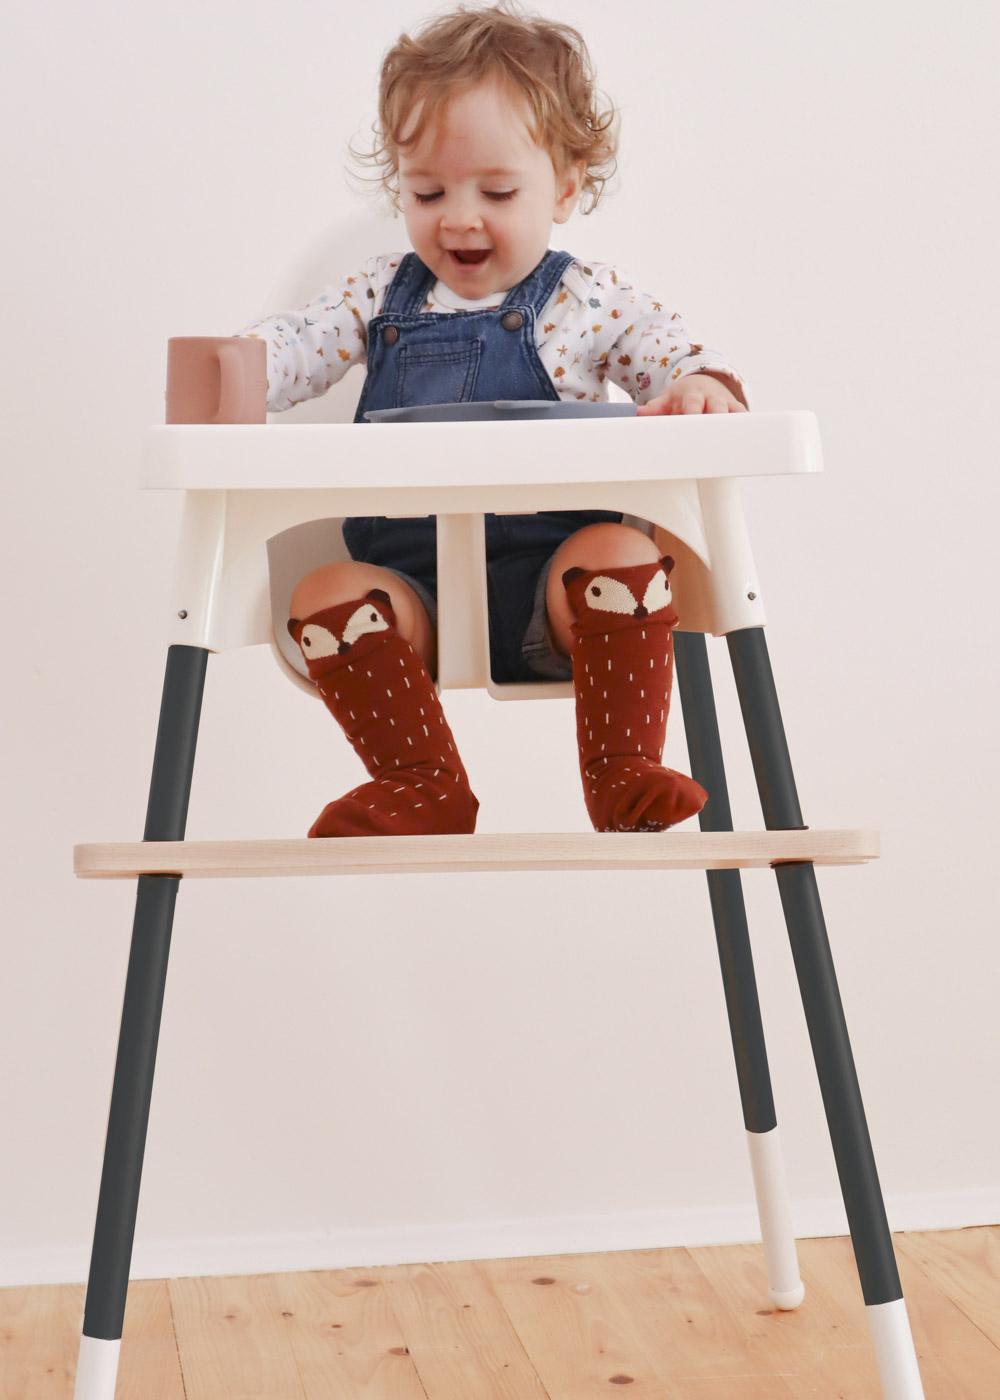 Fußstütze IKEA Antilop Hochstuhl mit Kind